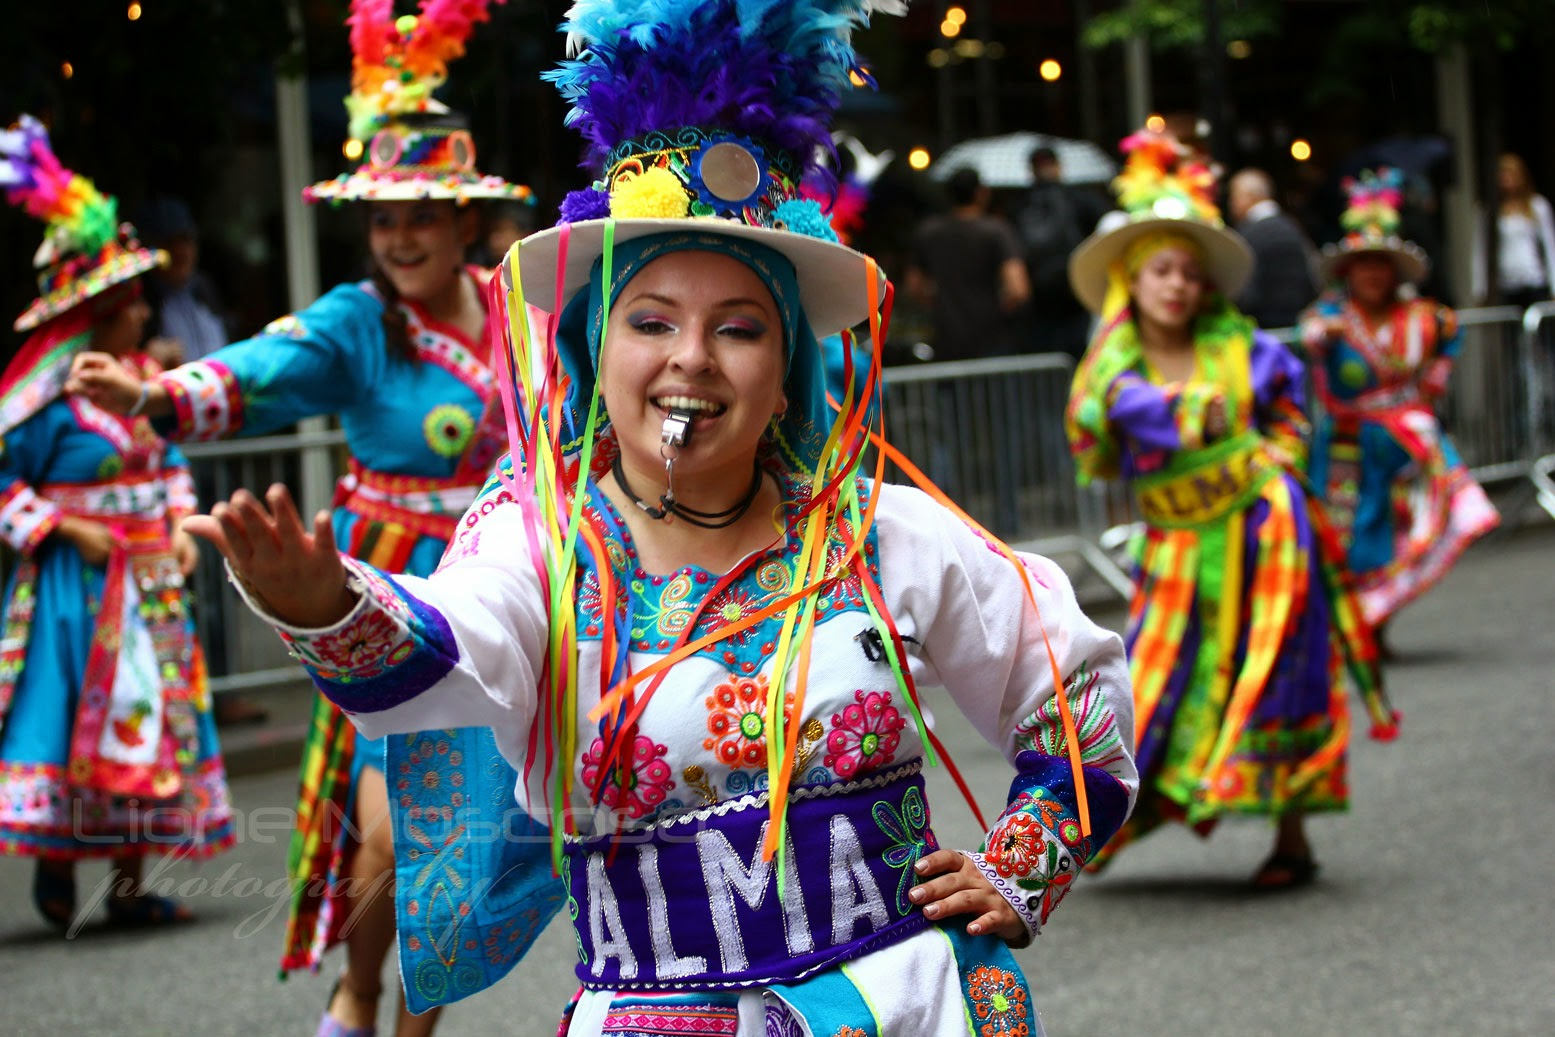 danzas bolivianas chicas cultura folklorica boliviana - danza del Tinku